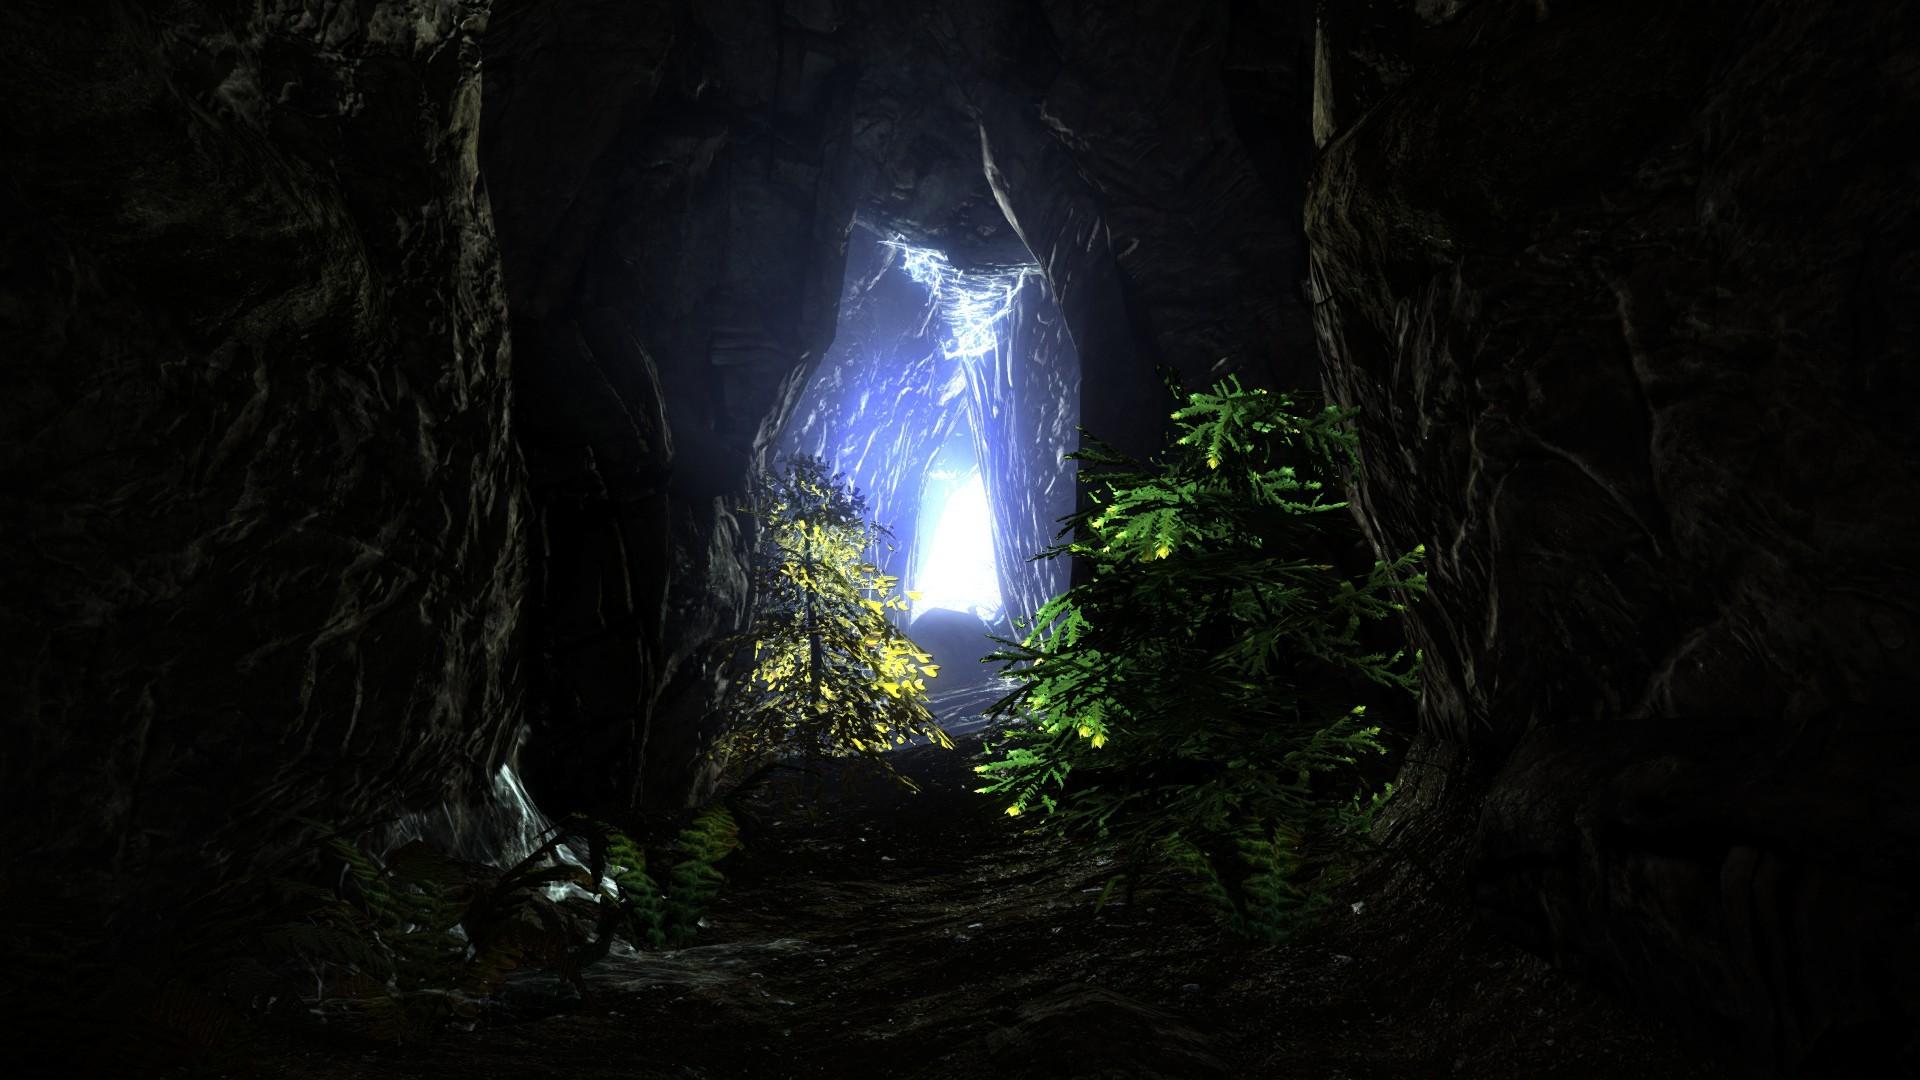 Hd wallpaper cave - Light Cave Wallpaper 1920x1080 Light Cave Tunnel The Elder